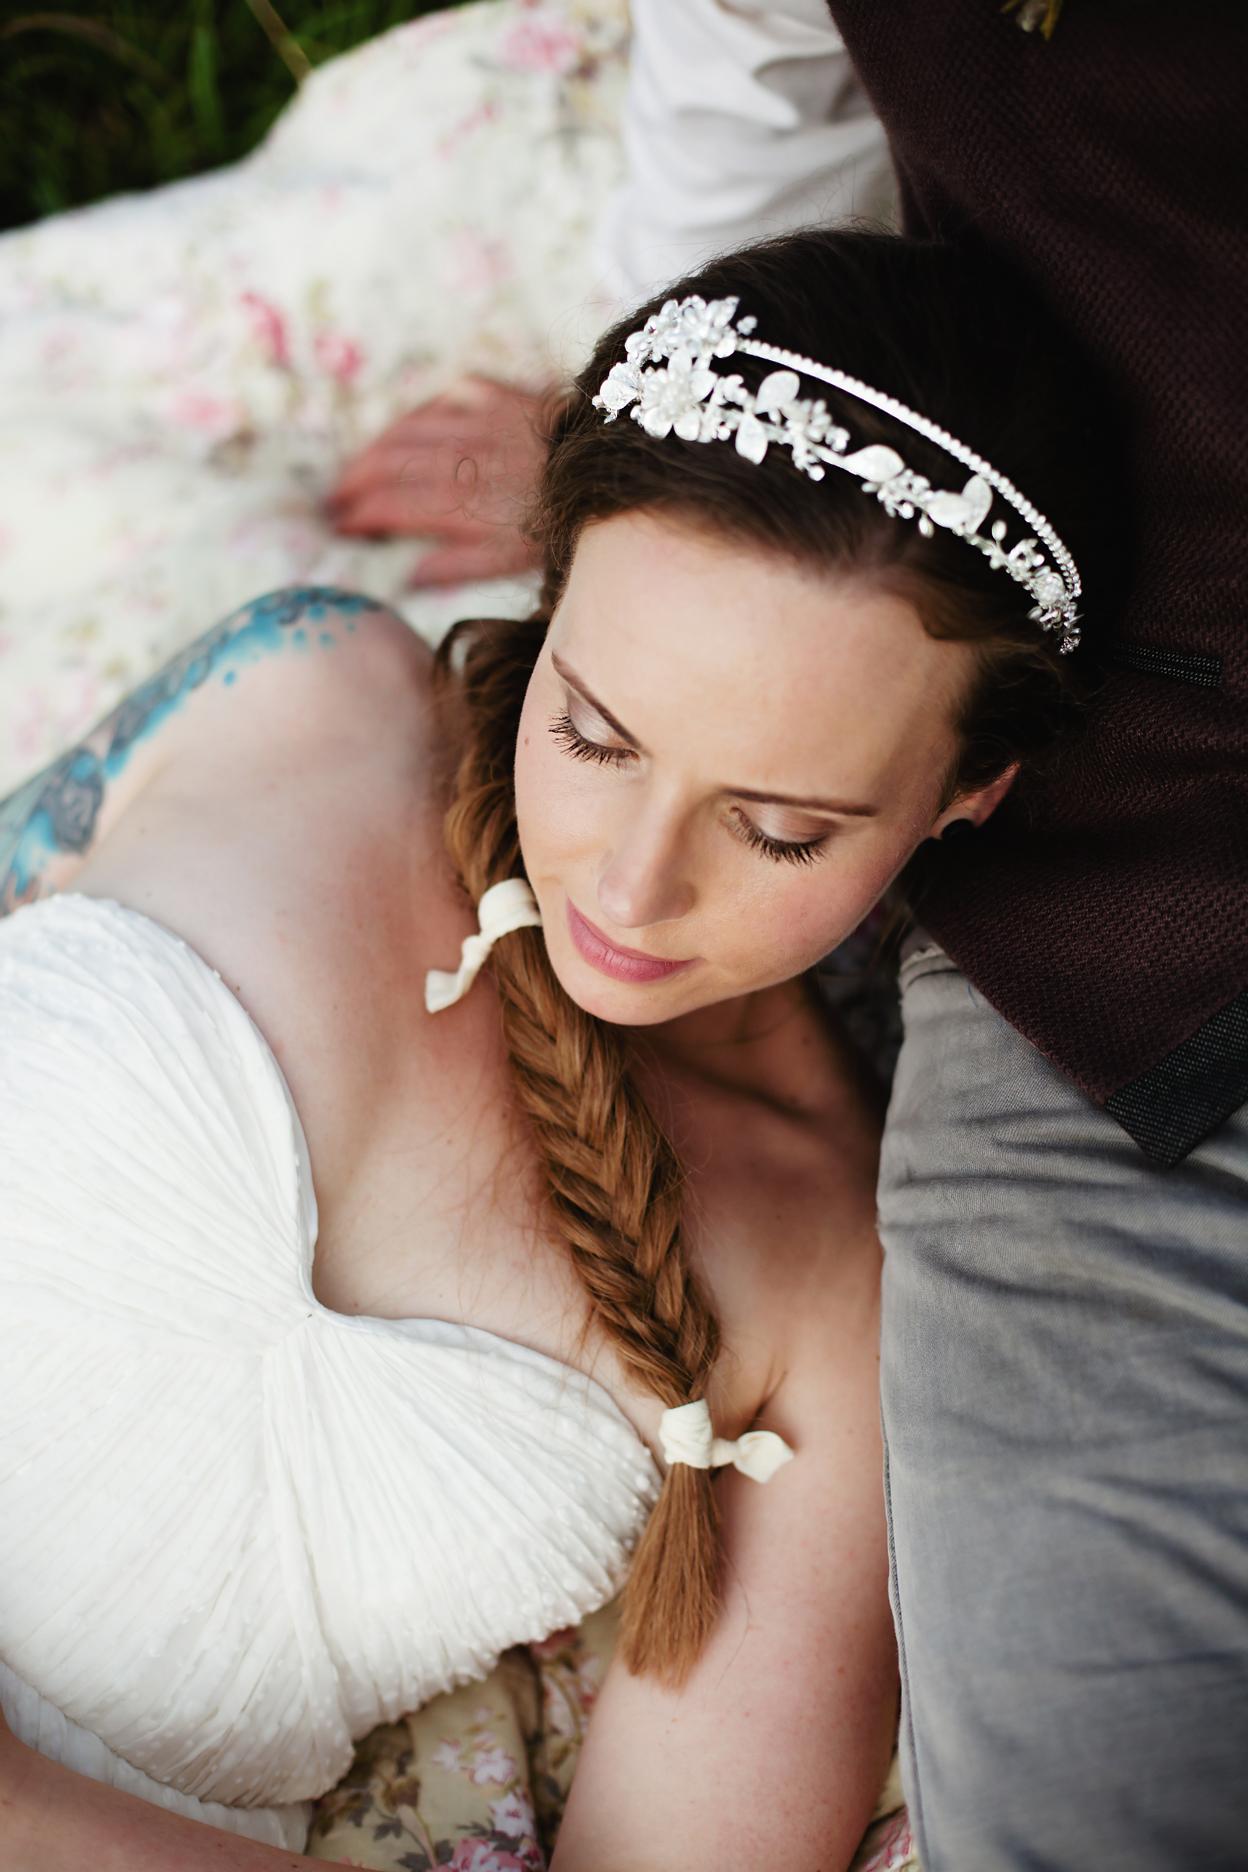 clewell-photography-minneapolis-farm-hunger-games-wedding-40.1.jpg